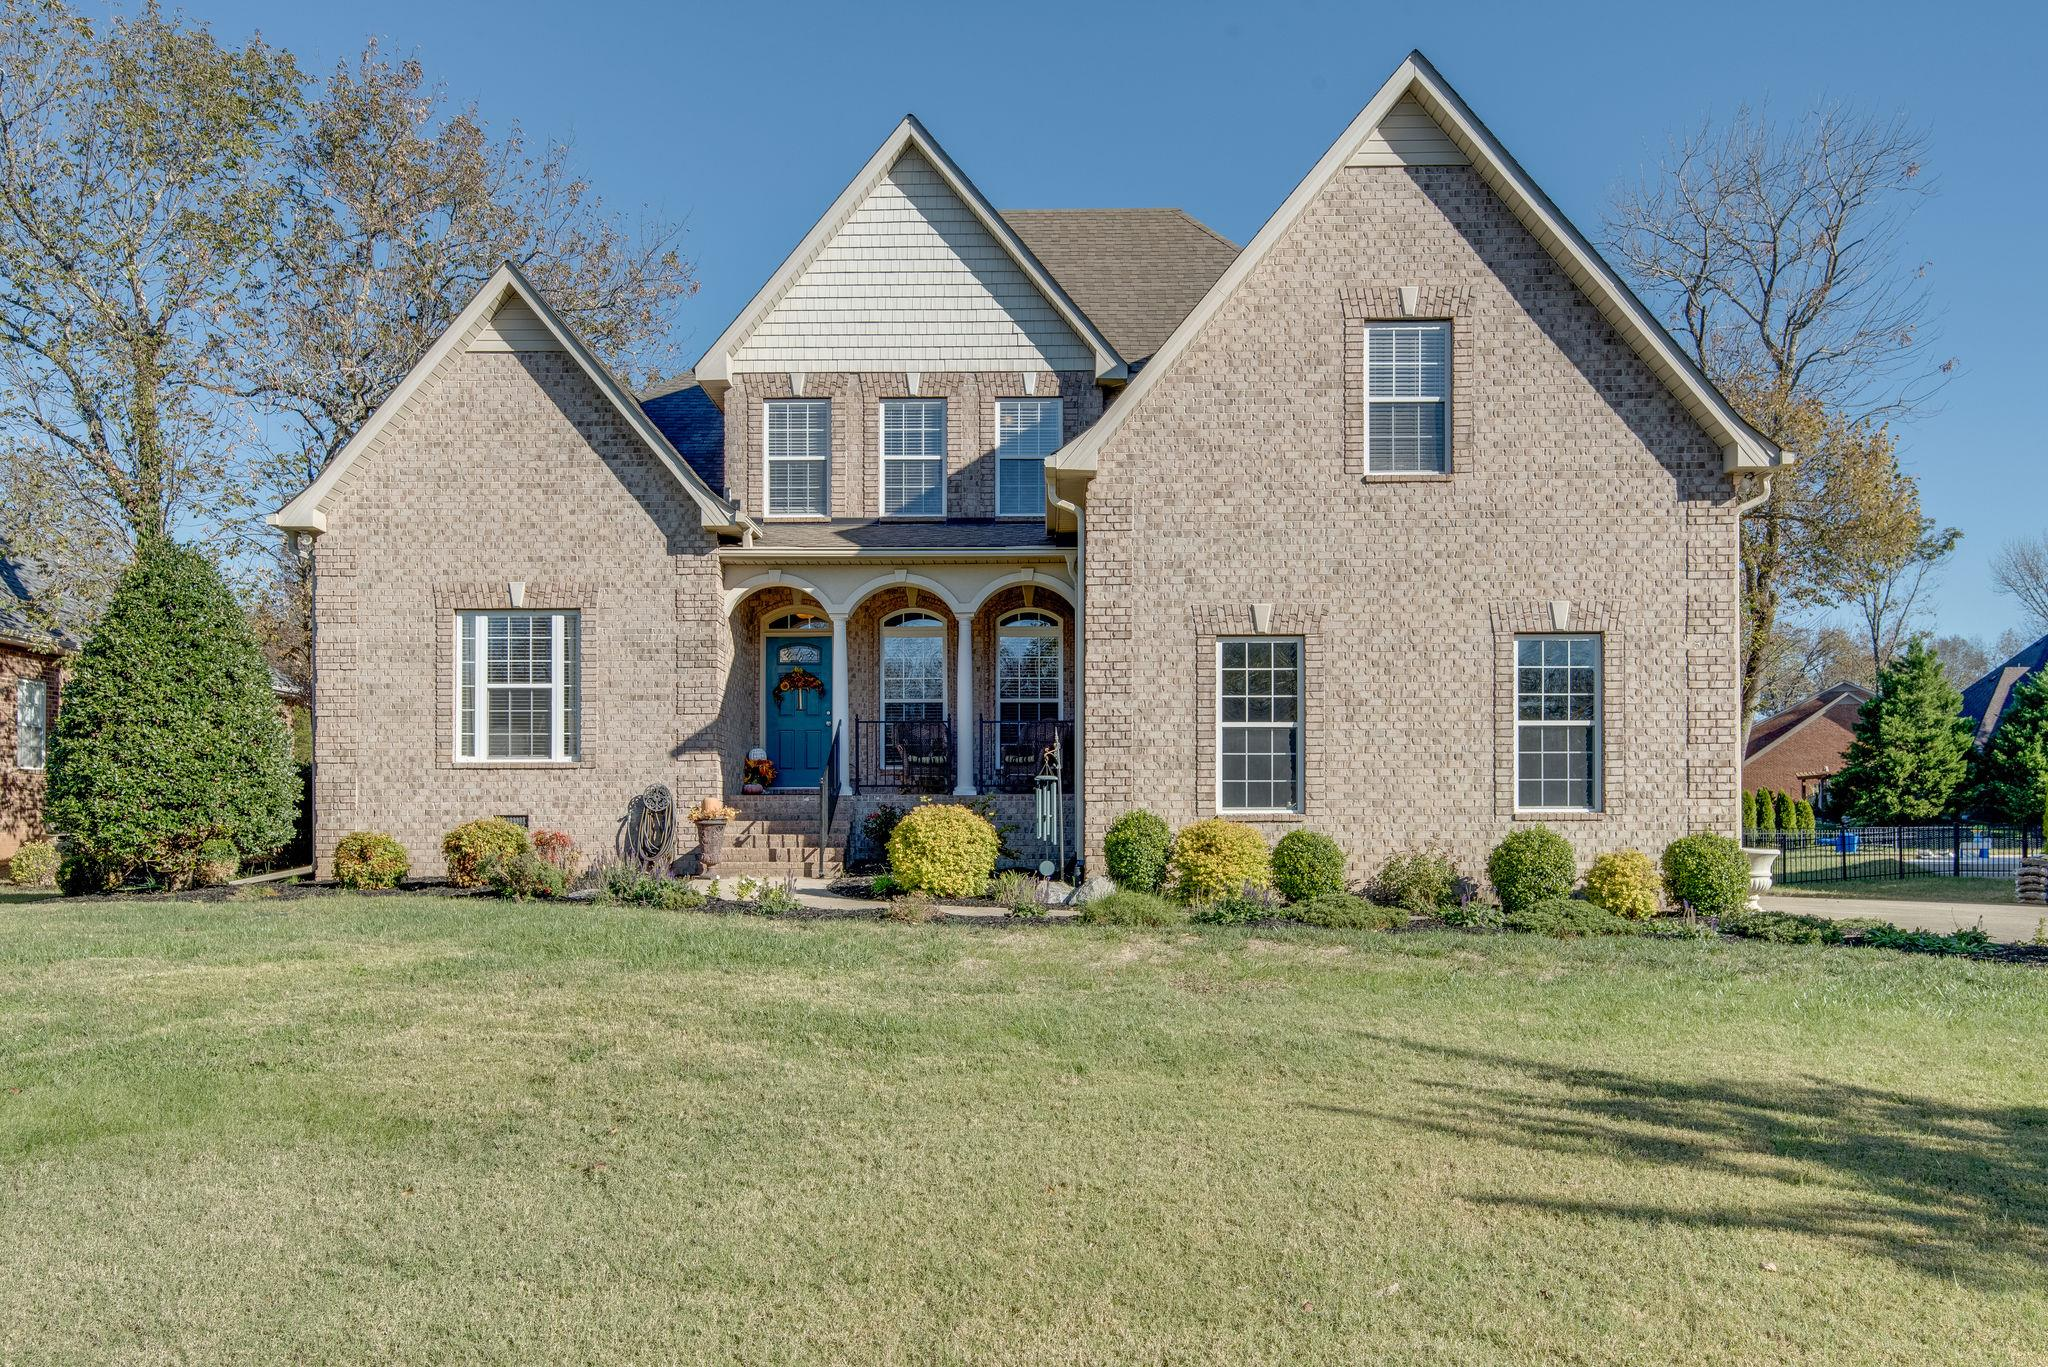 5412 Cliffstone Dr, Smyrna, TN 37167 - Smyrna, TN real estate listing